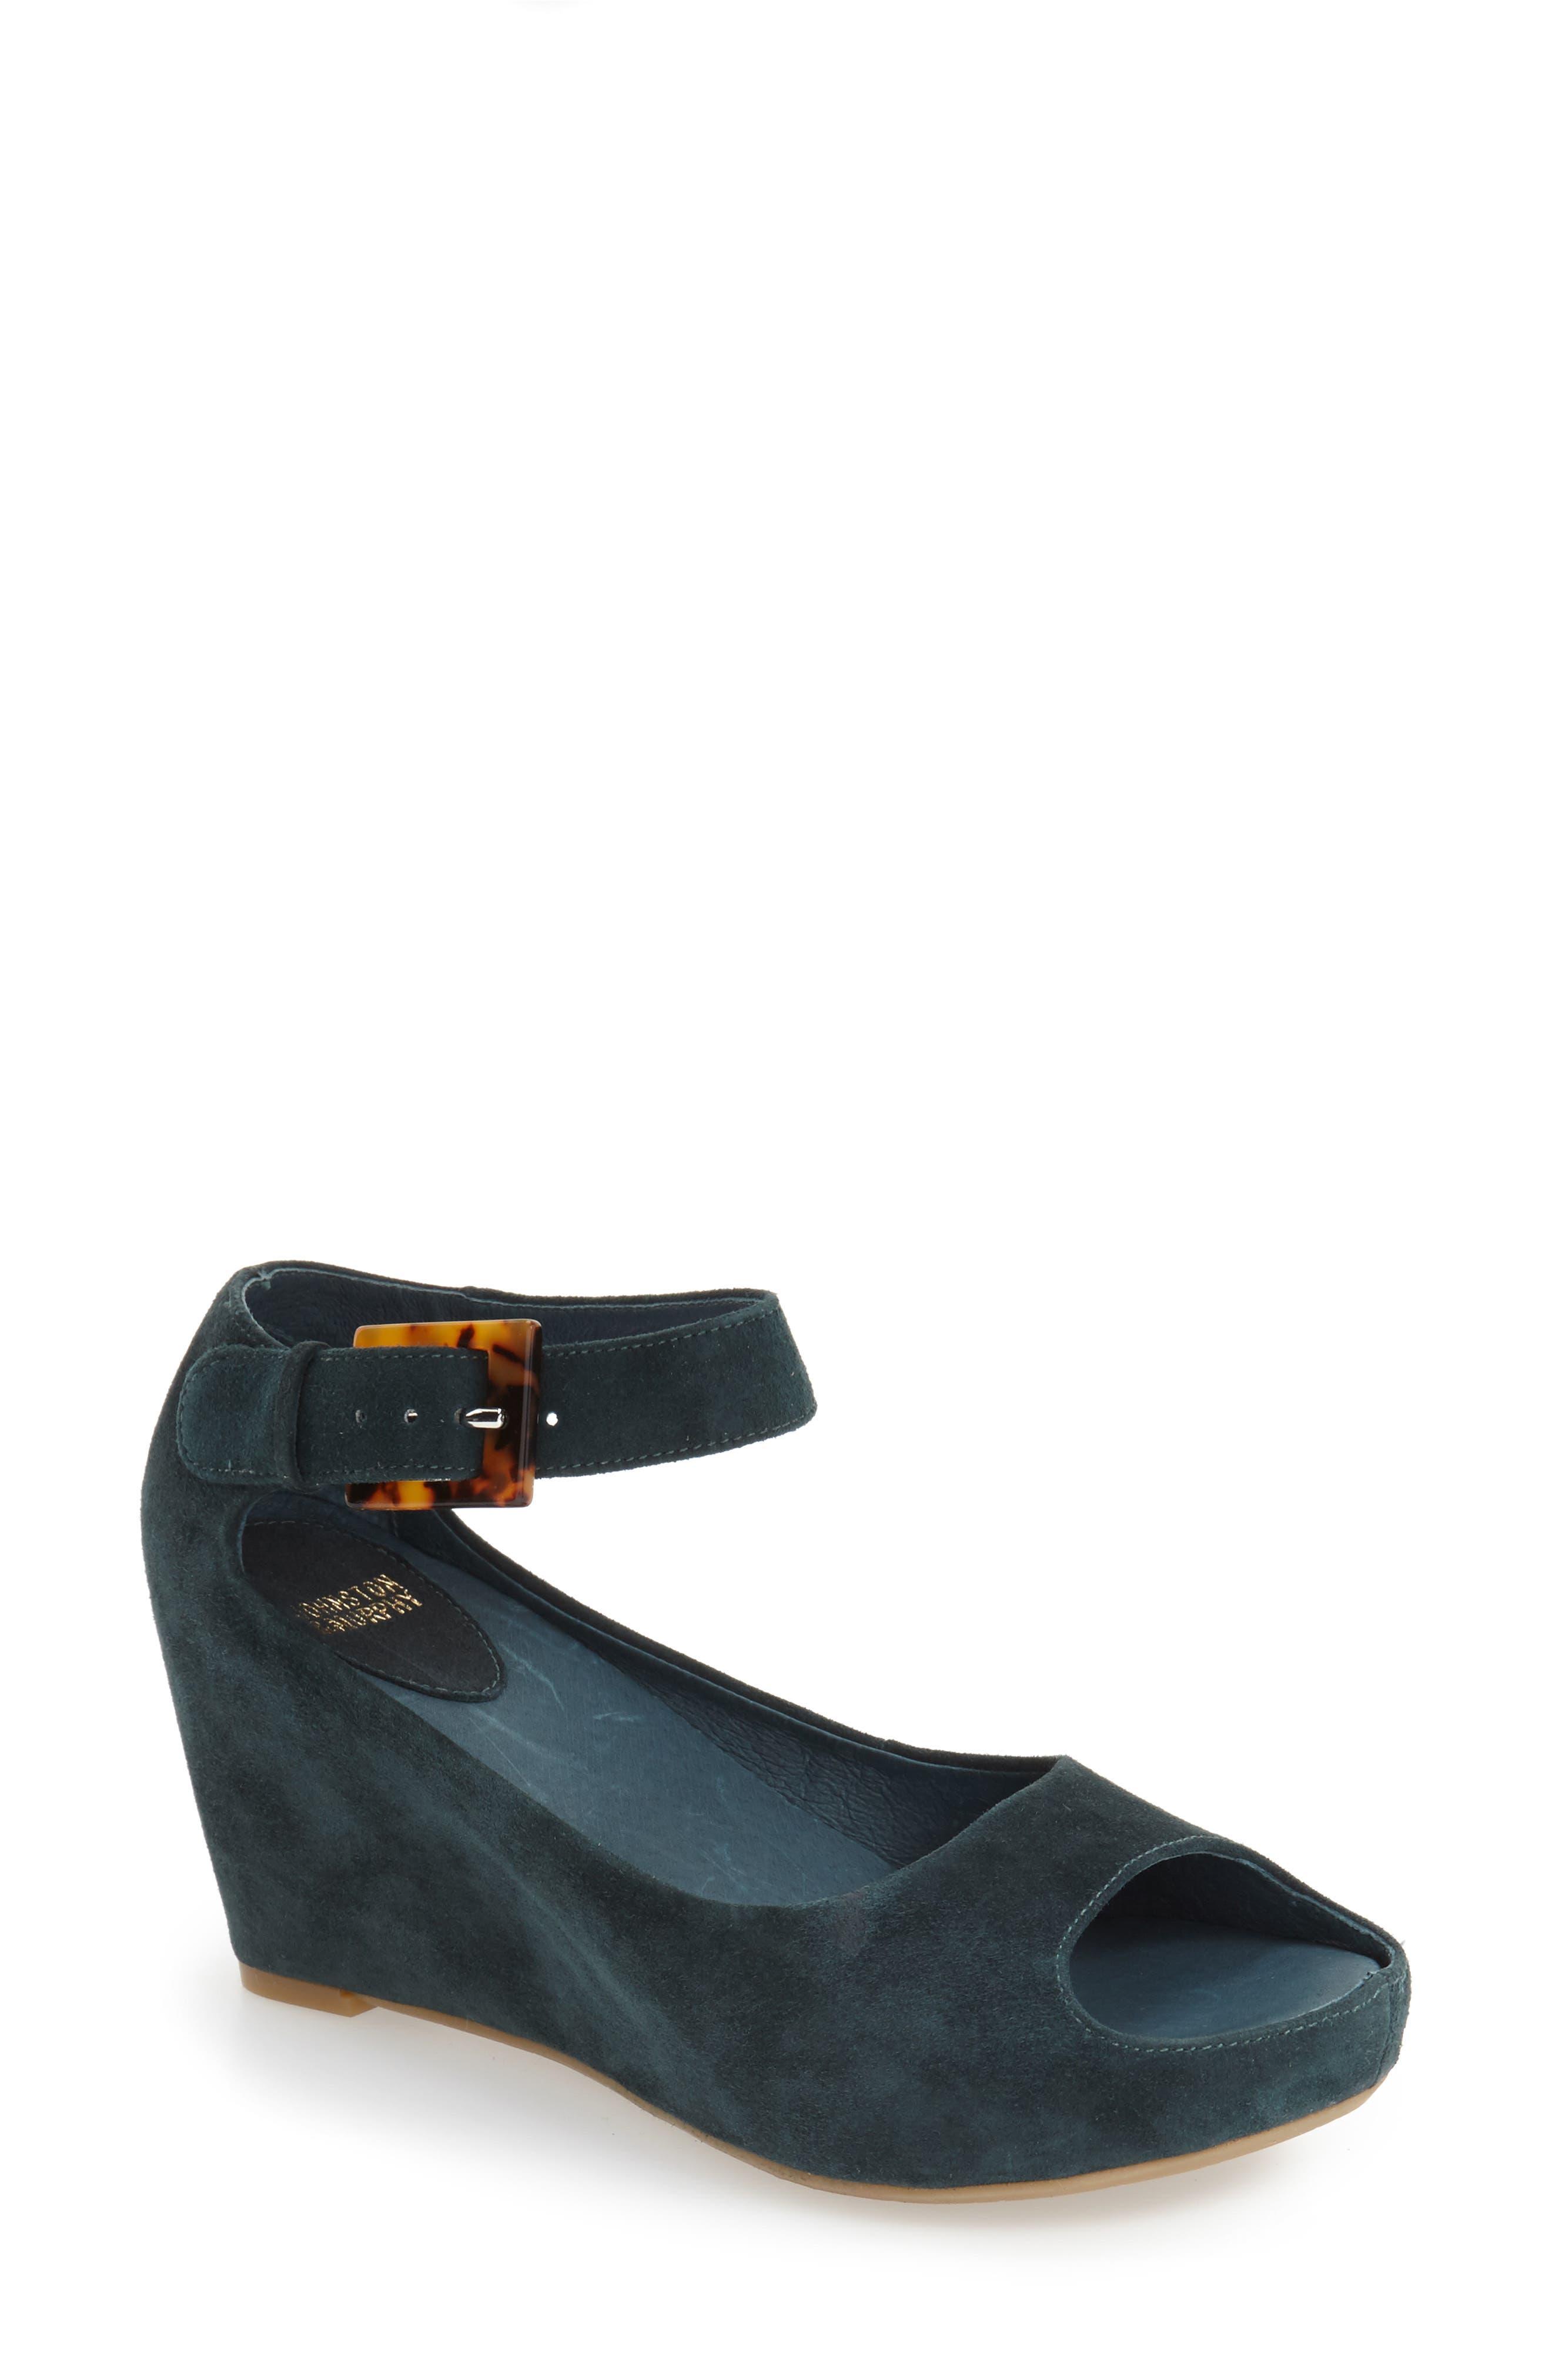 'Tricia' Ankle Strap Sandal,                             Alternate thumbnail 27, color,